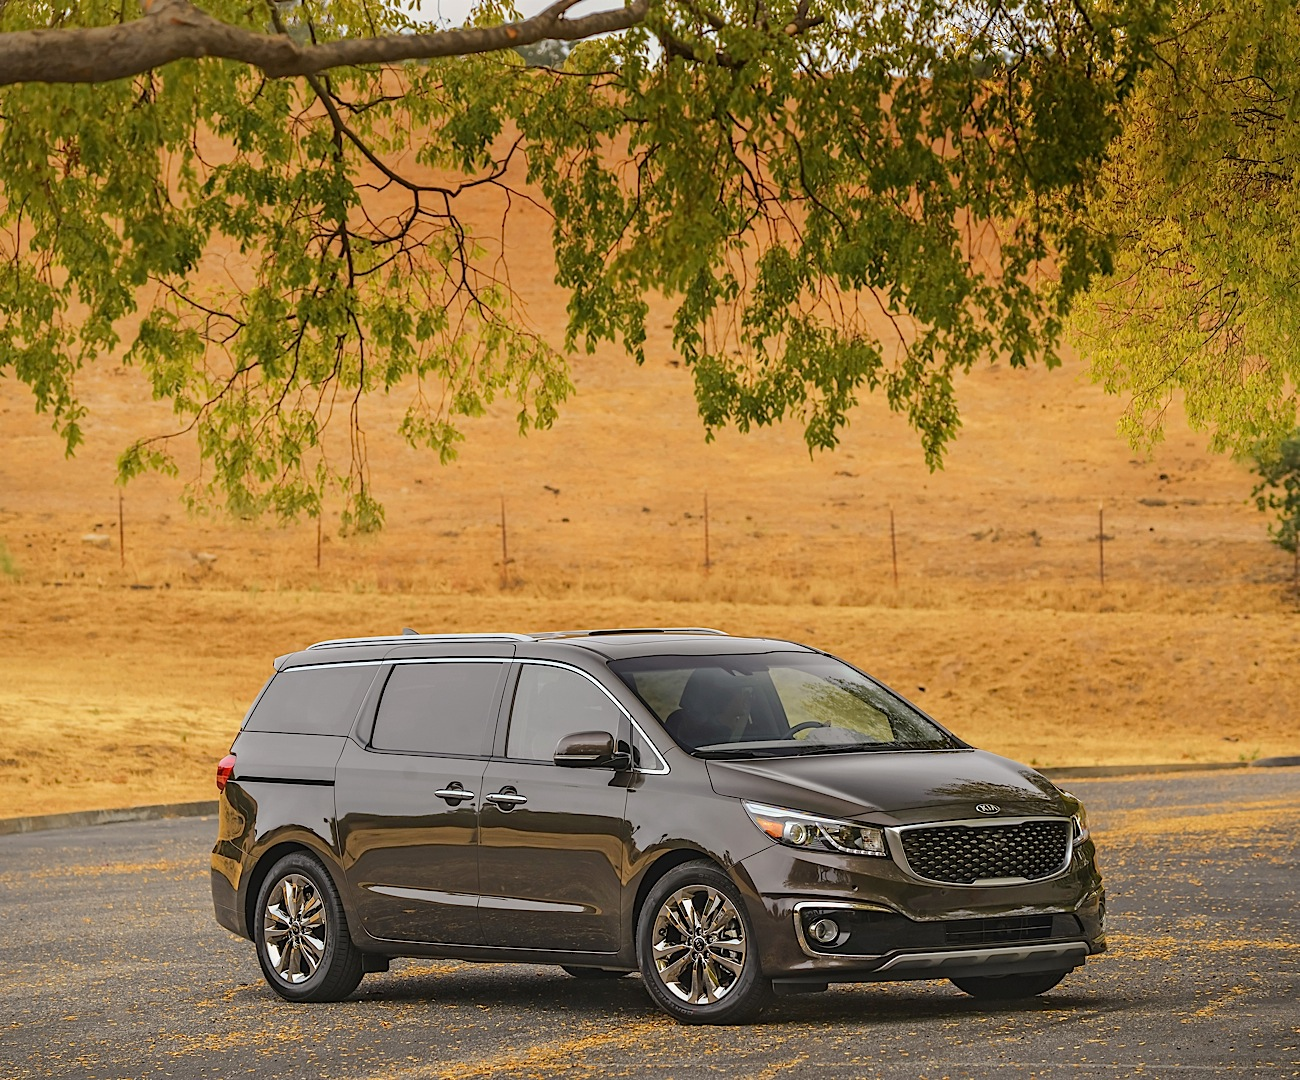 2015 kia sedona commercial makes fun of ford c max powered liftgate autoevolution